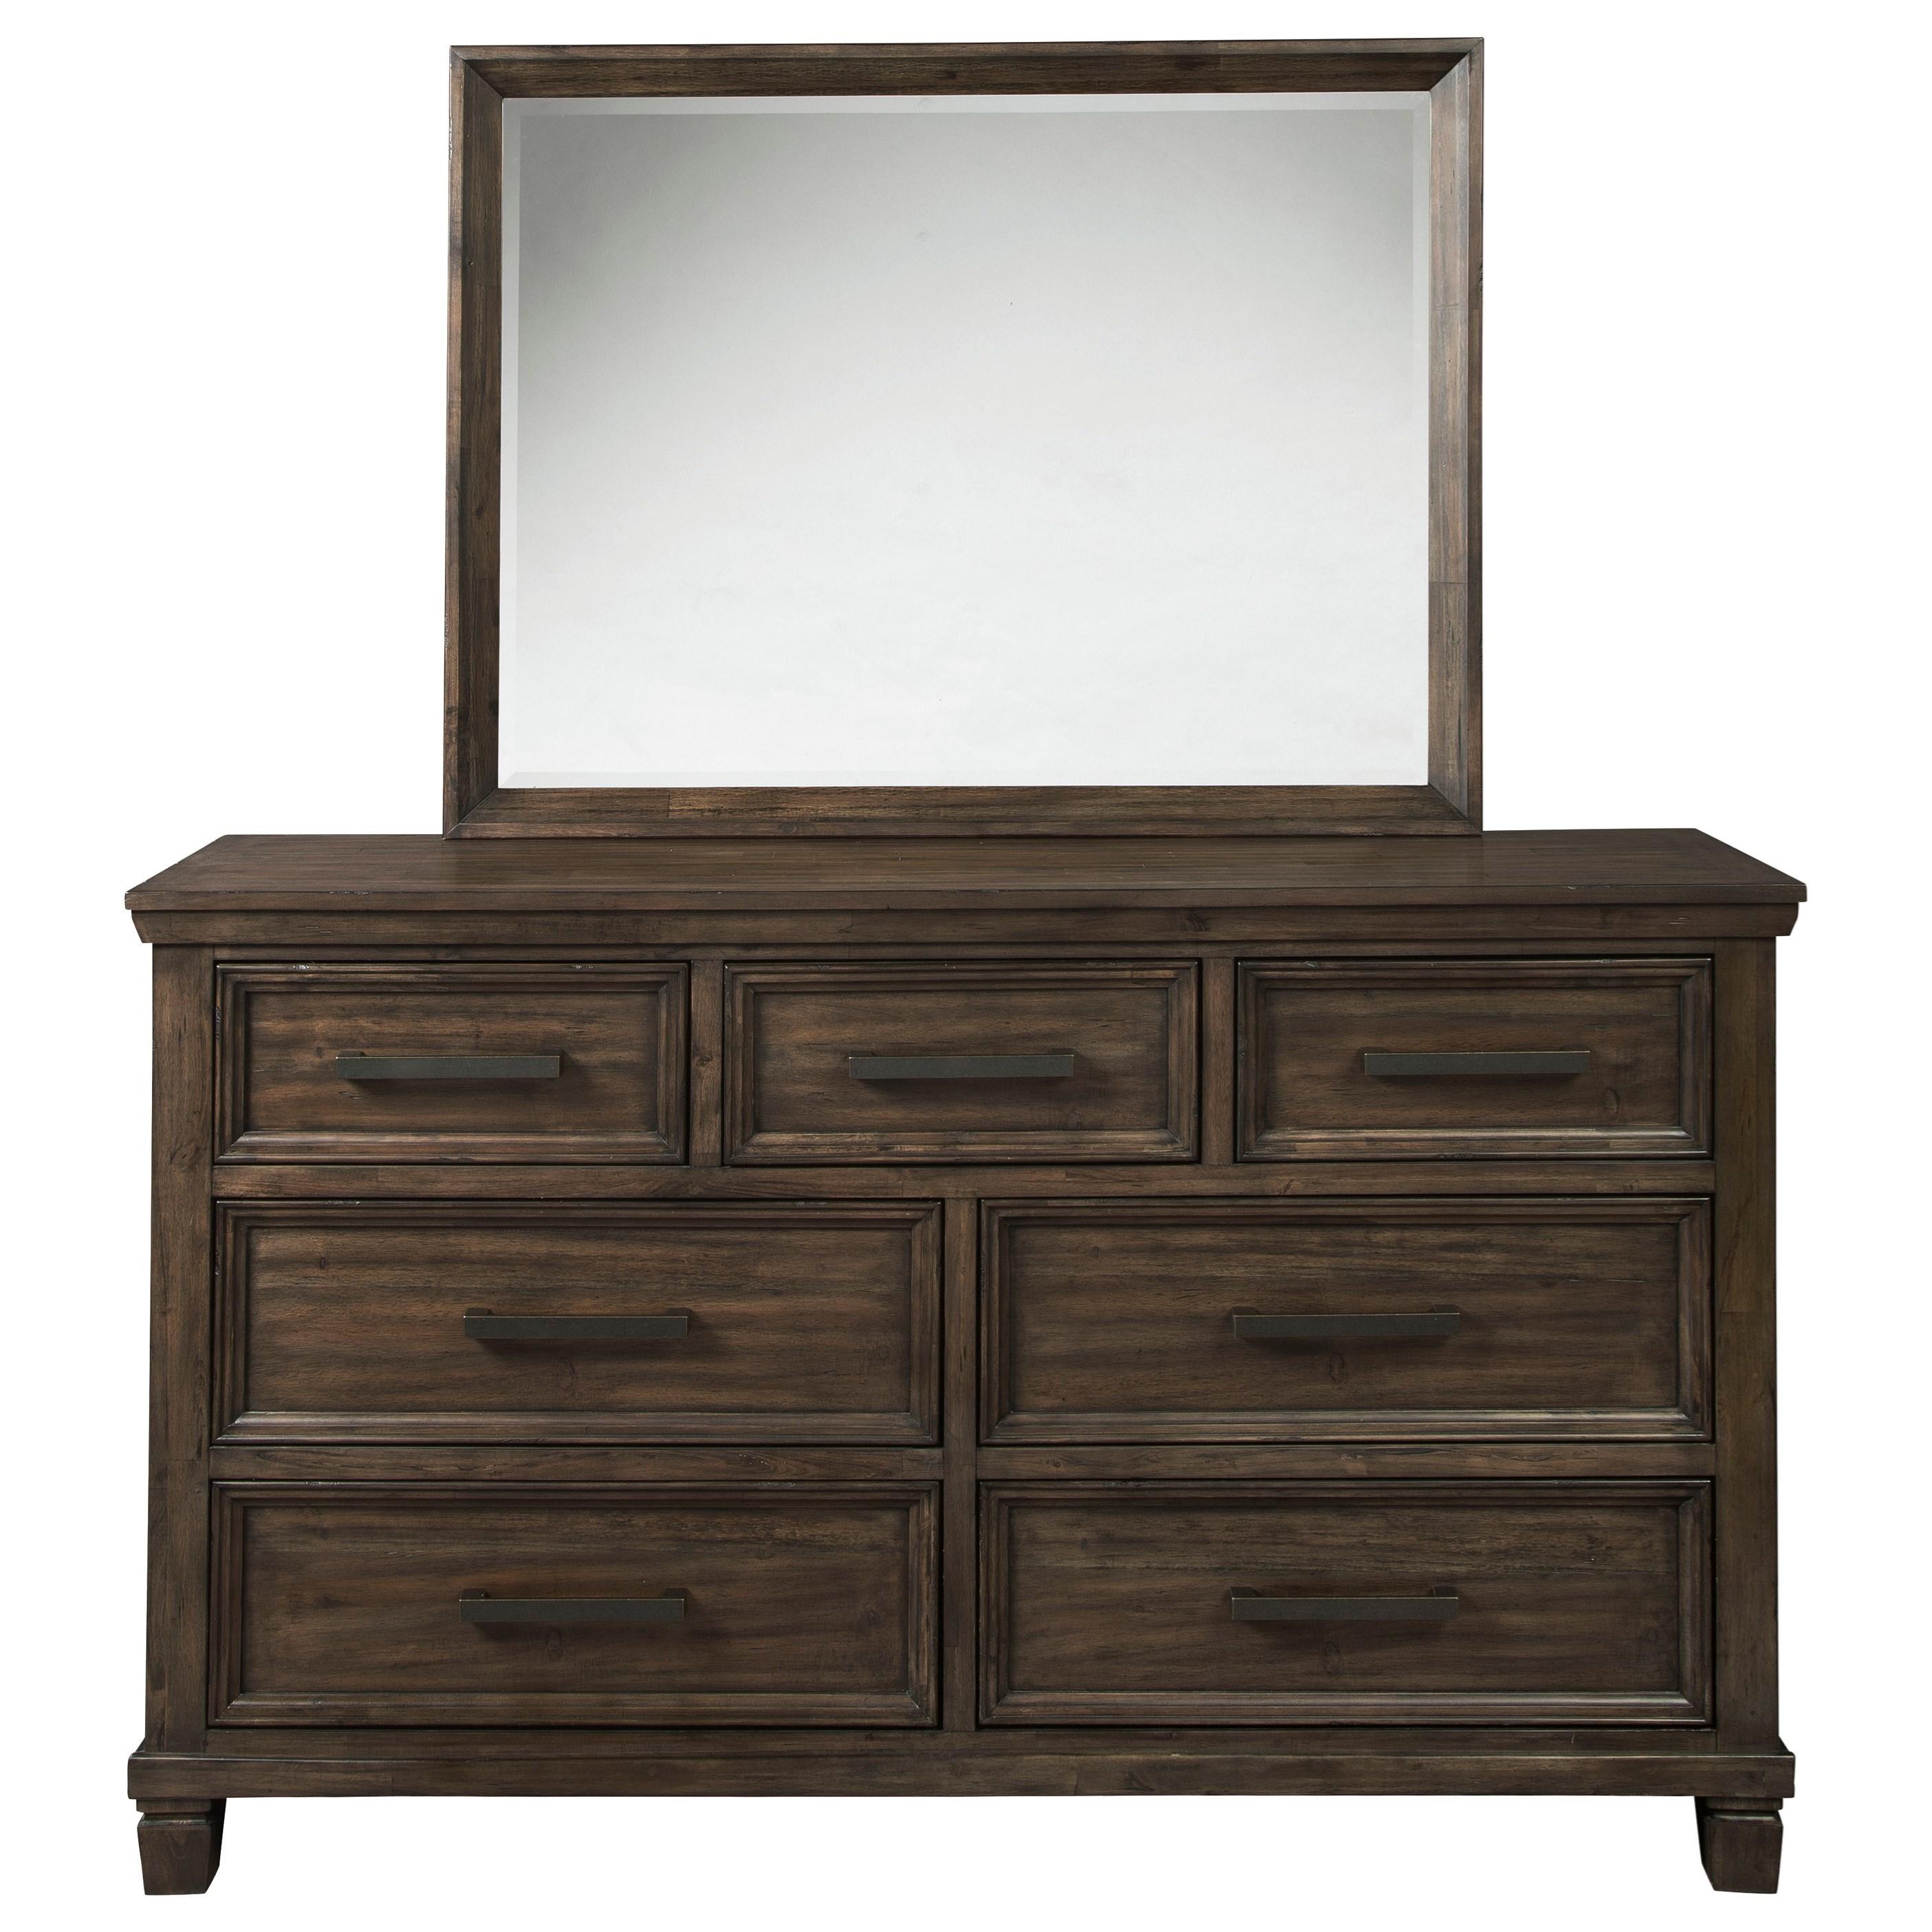 Johurst Dresser and Mirror Set by Signature at Walker's Furniture